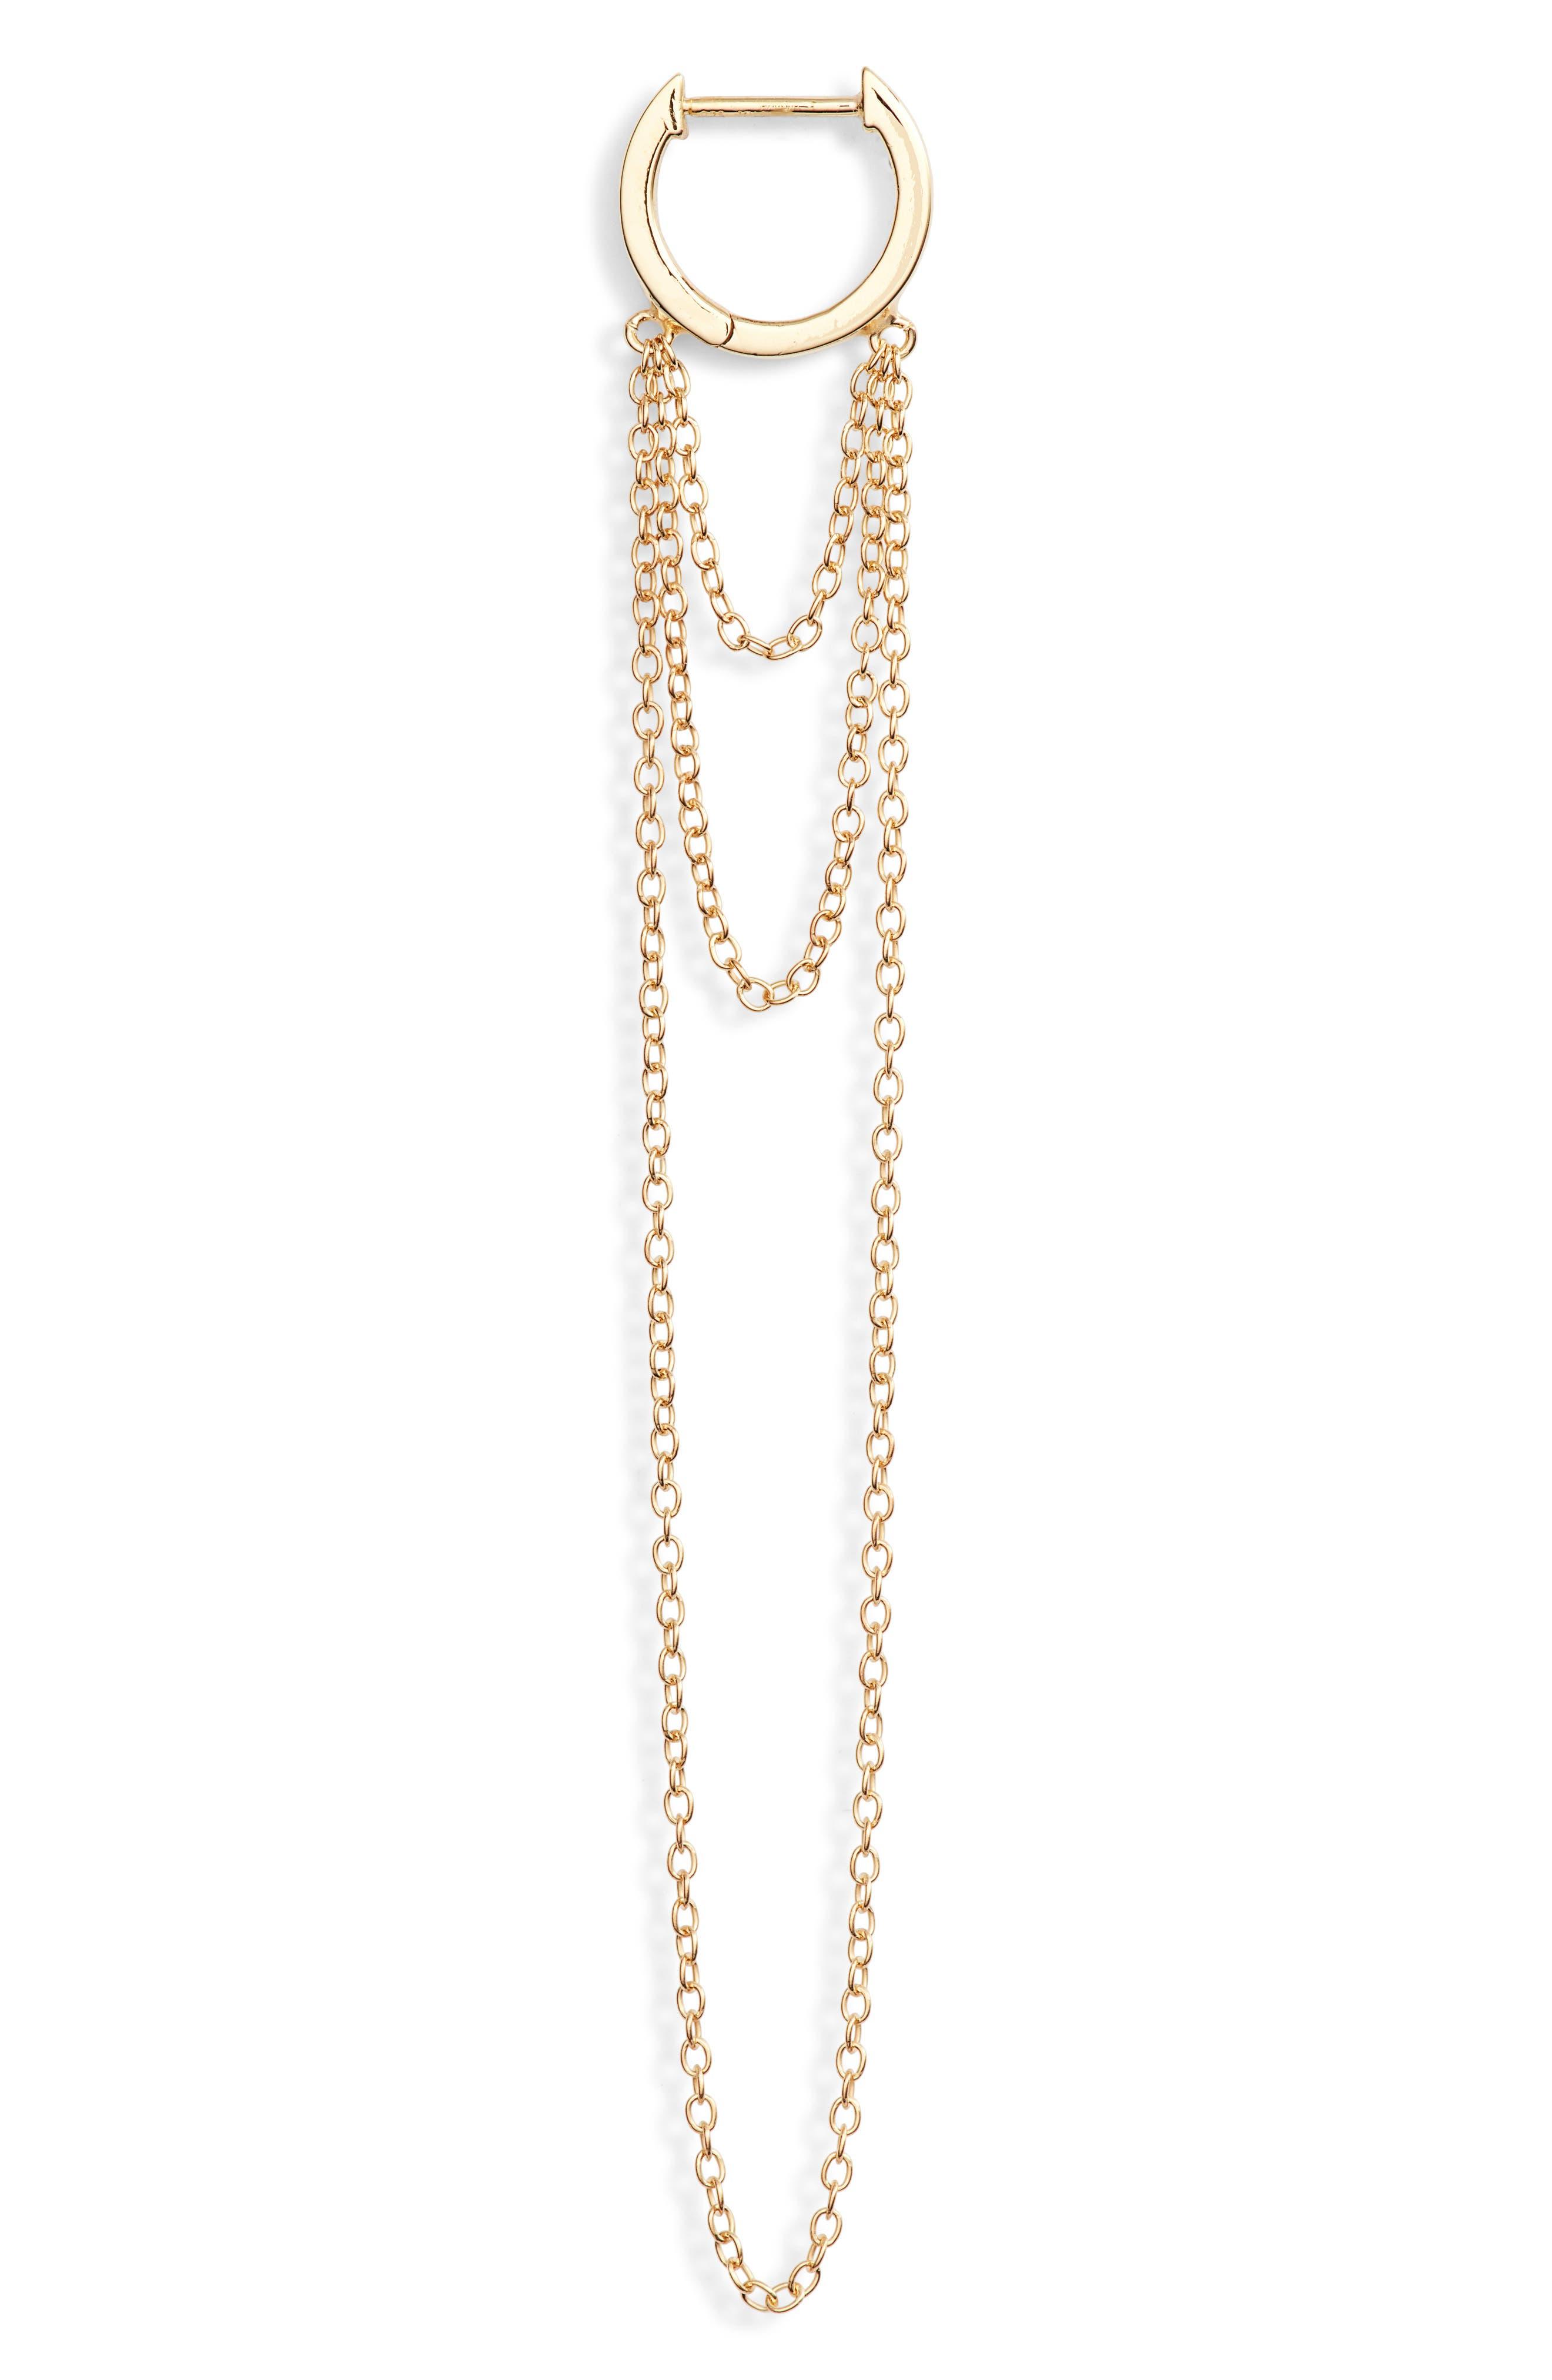 Elmar Huggie Chain earrings,                             Alternate thumbnail 3, color,                             710